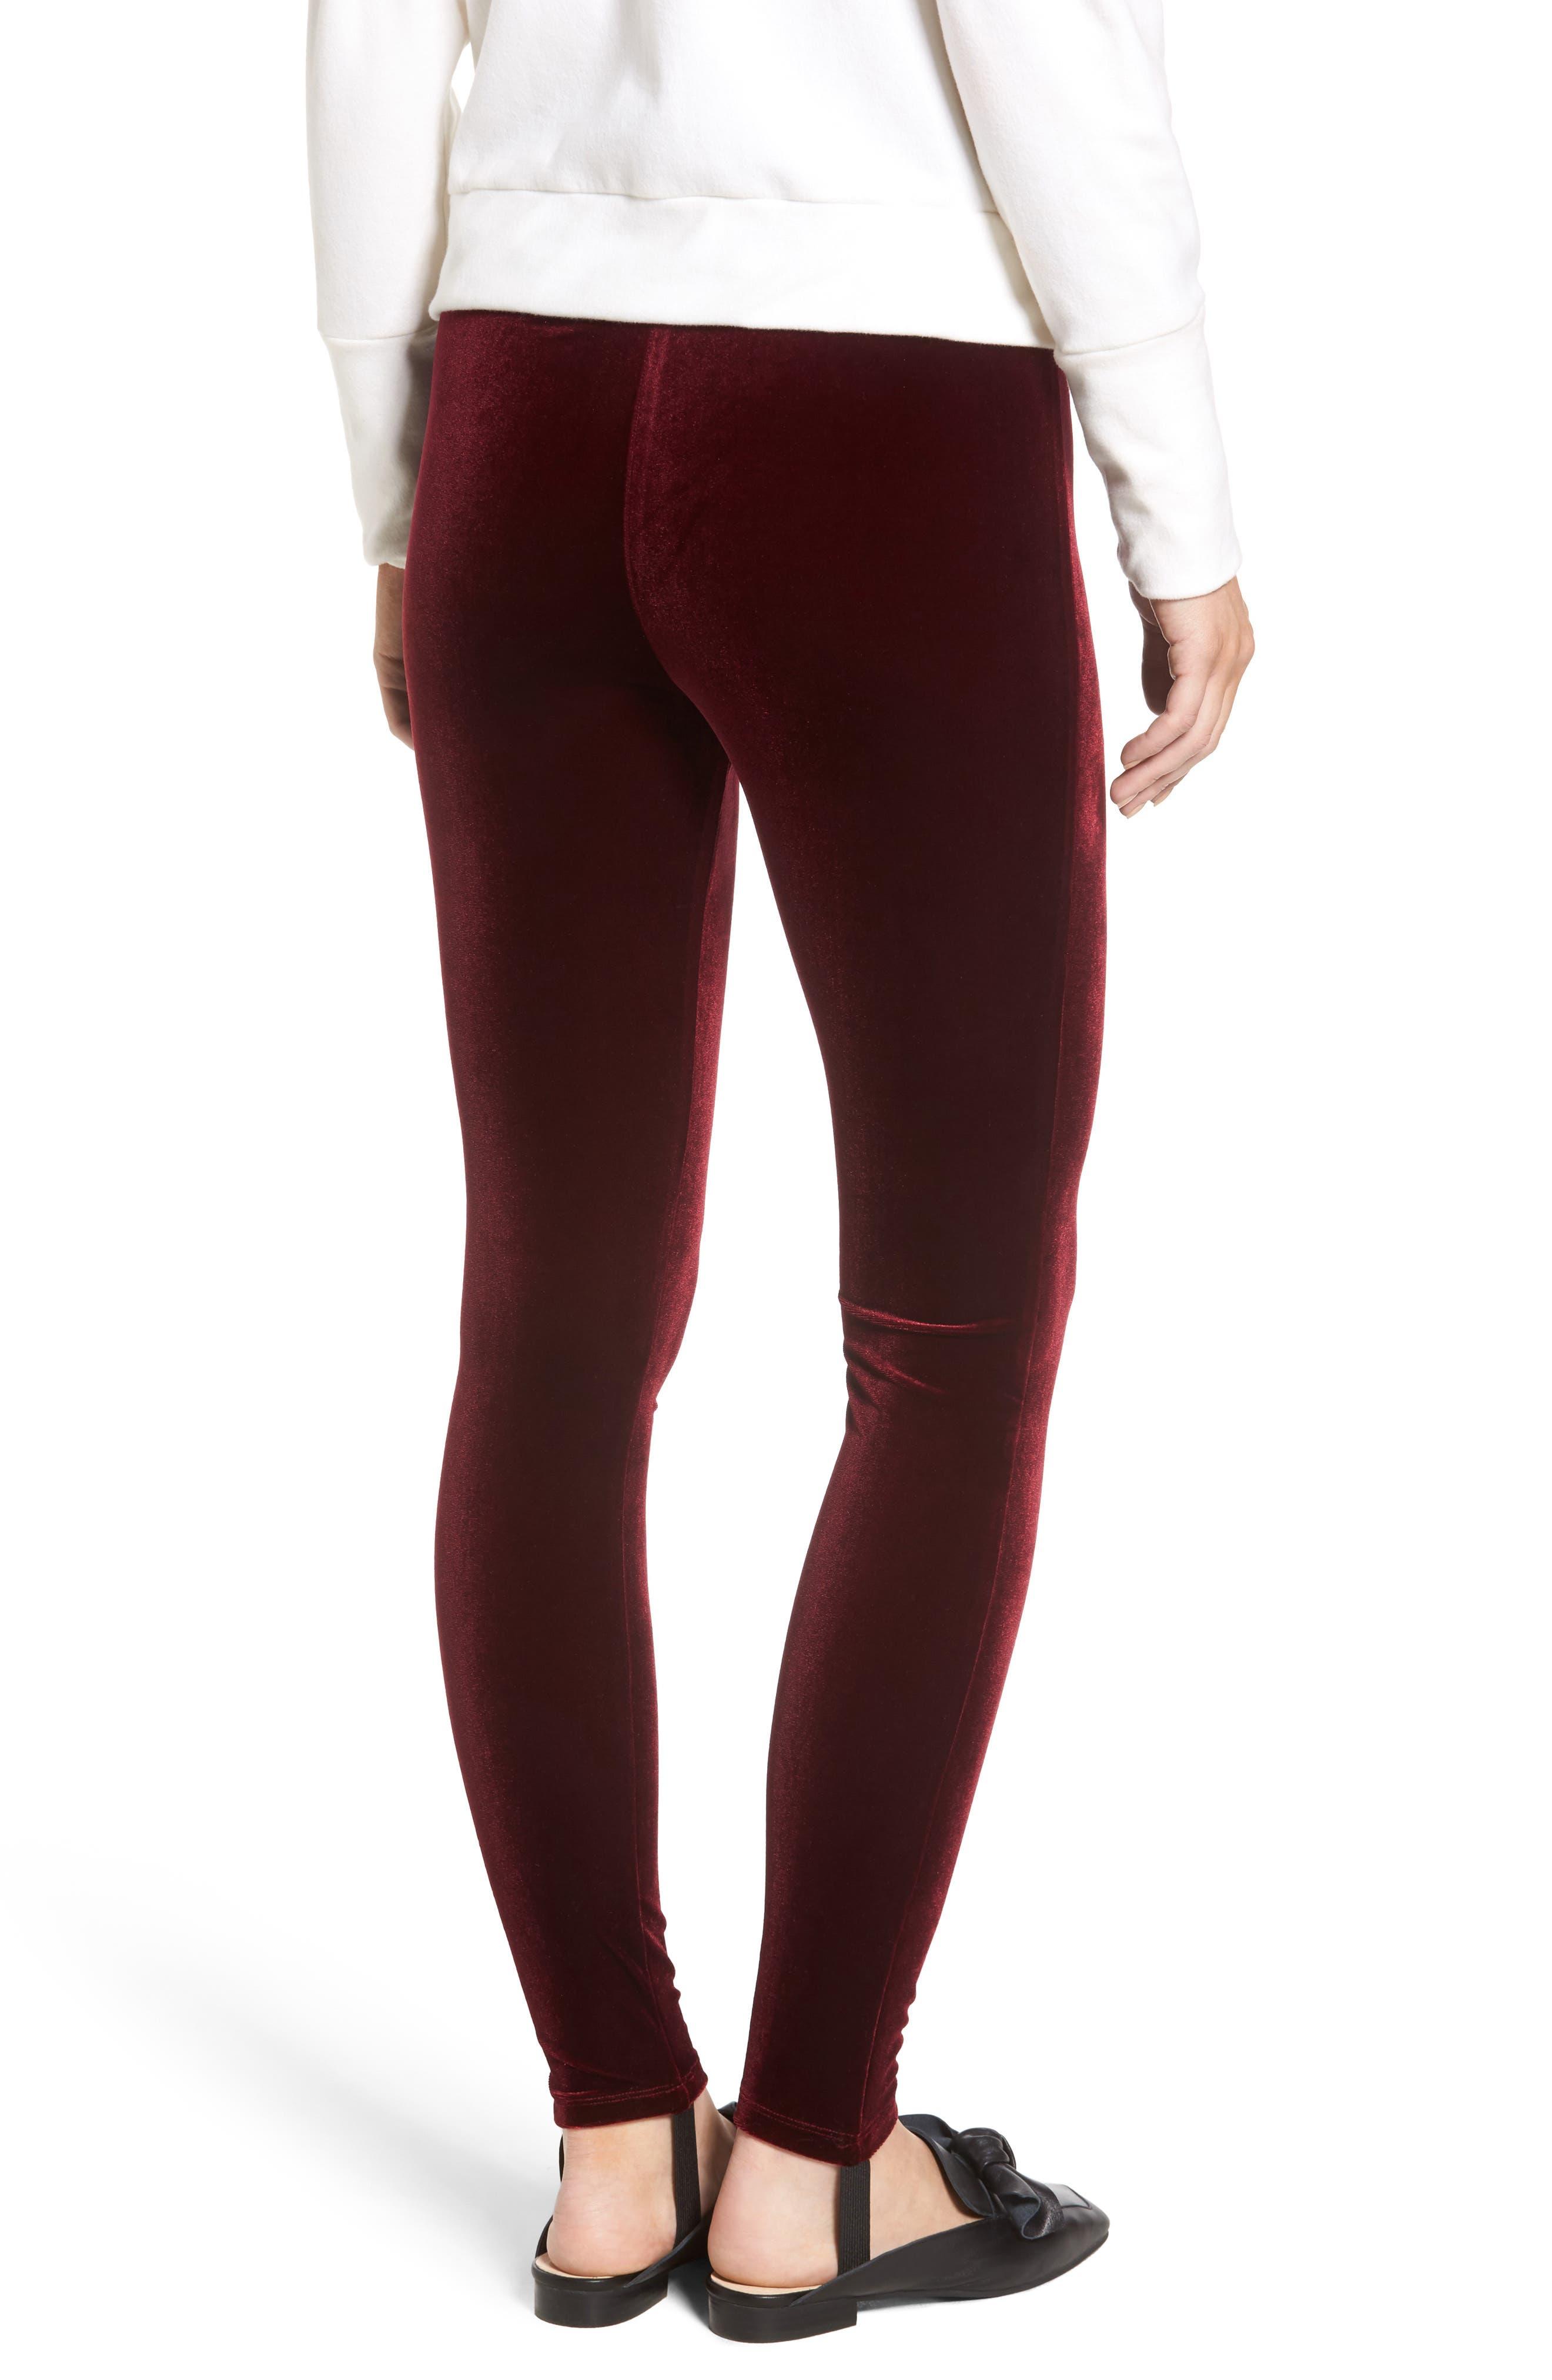 High Waist Velour Stirrup Pants,                             Alternate thumbnail 2, color,                             Red Tannin